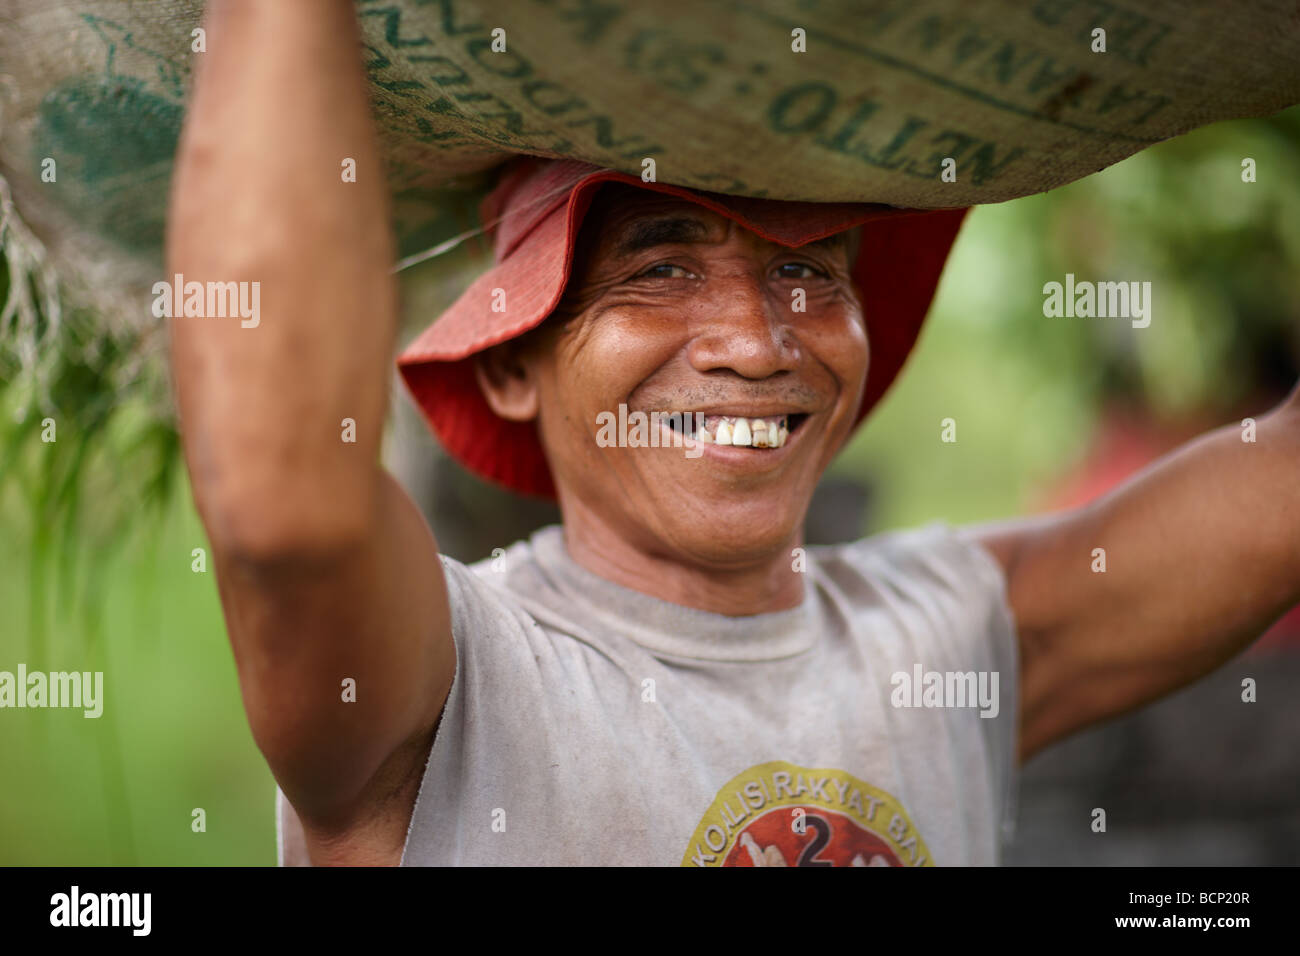 a farmer carrying a sack of rice on his head, nr Tirtagangga, Bali, Indonesia - Stock Image